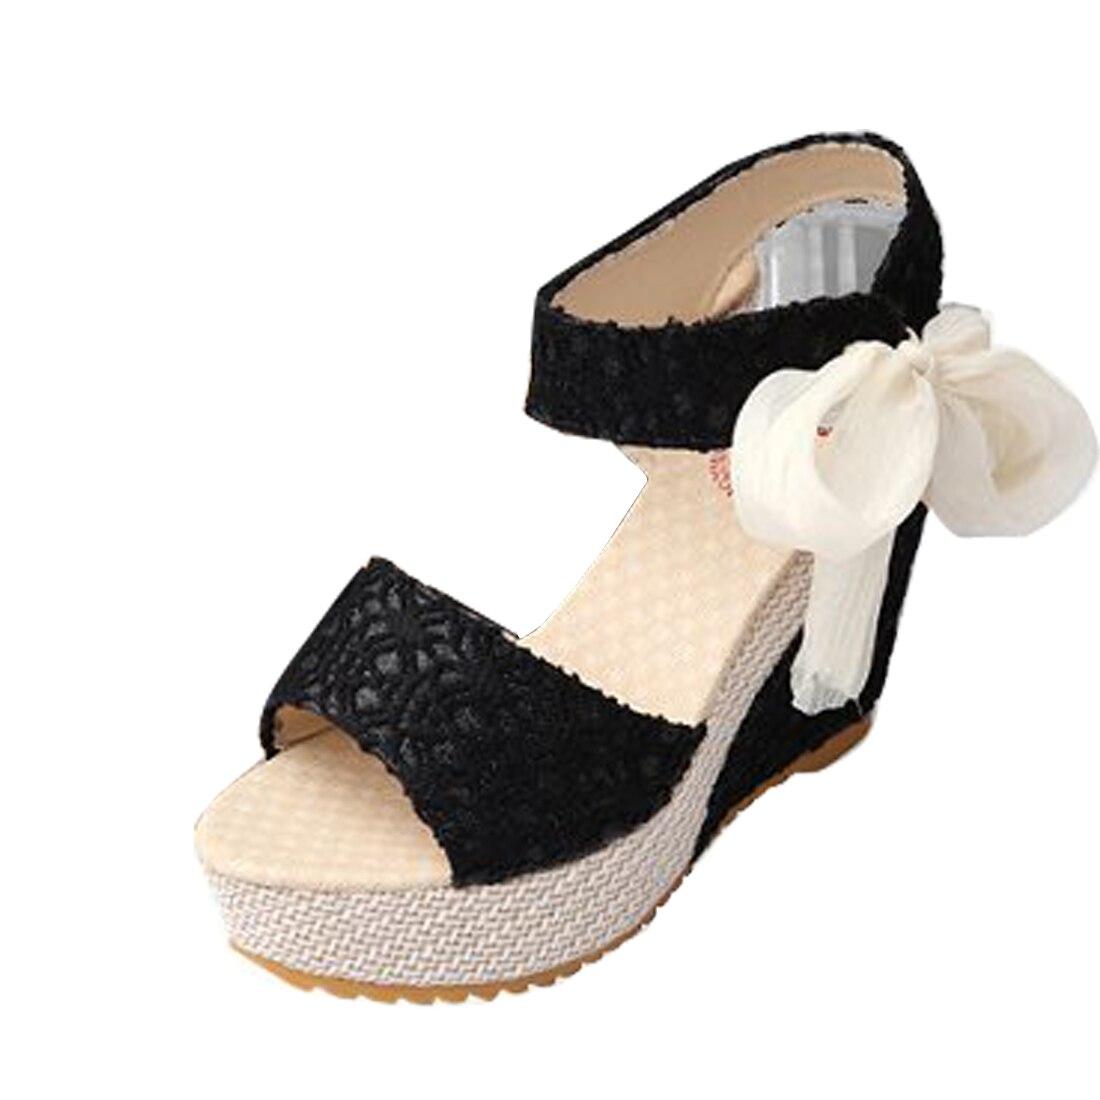 Fashion Women Sandals Summer Wedges Womens Sandals Platform Lace Belt Bow Flip Flops open toe high-heeled Women shoes Female<br><br>Aliexpress